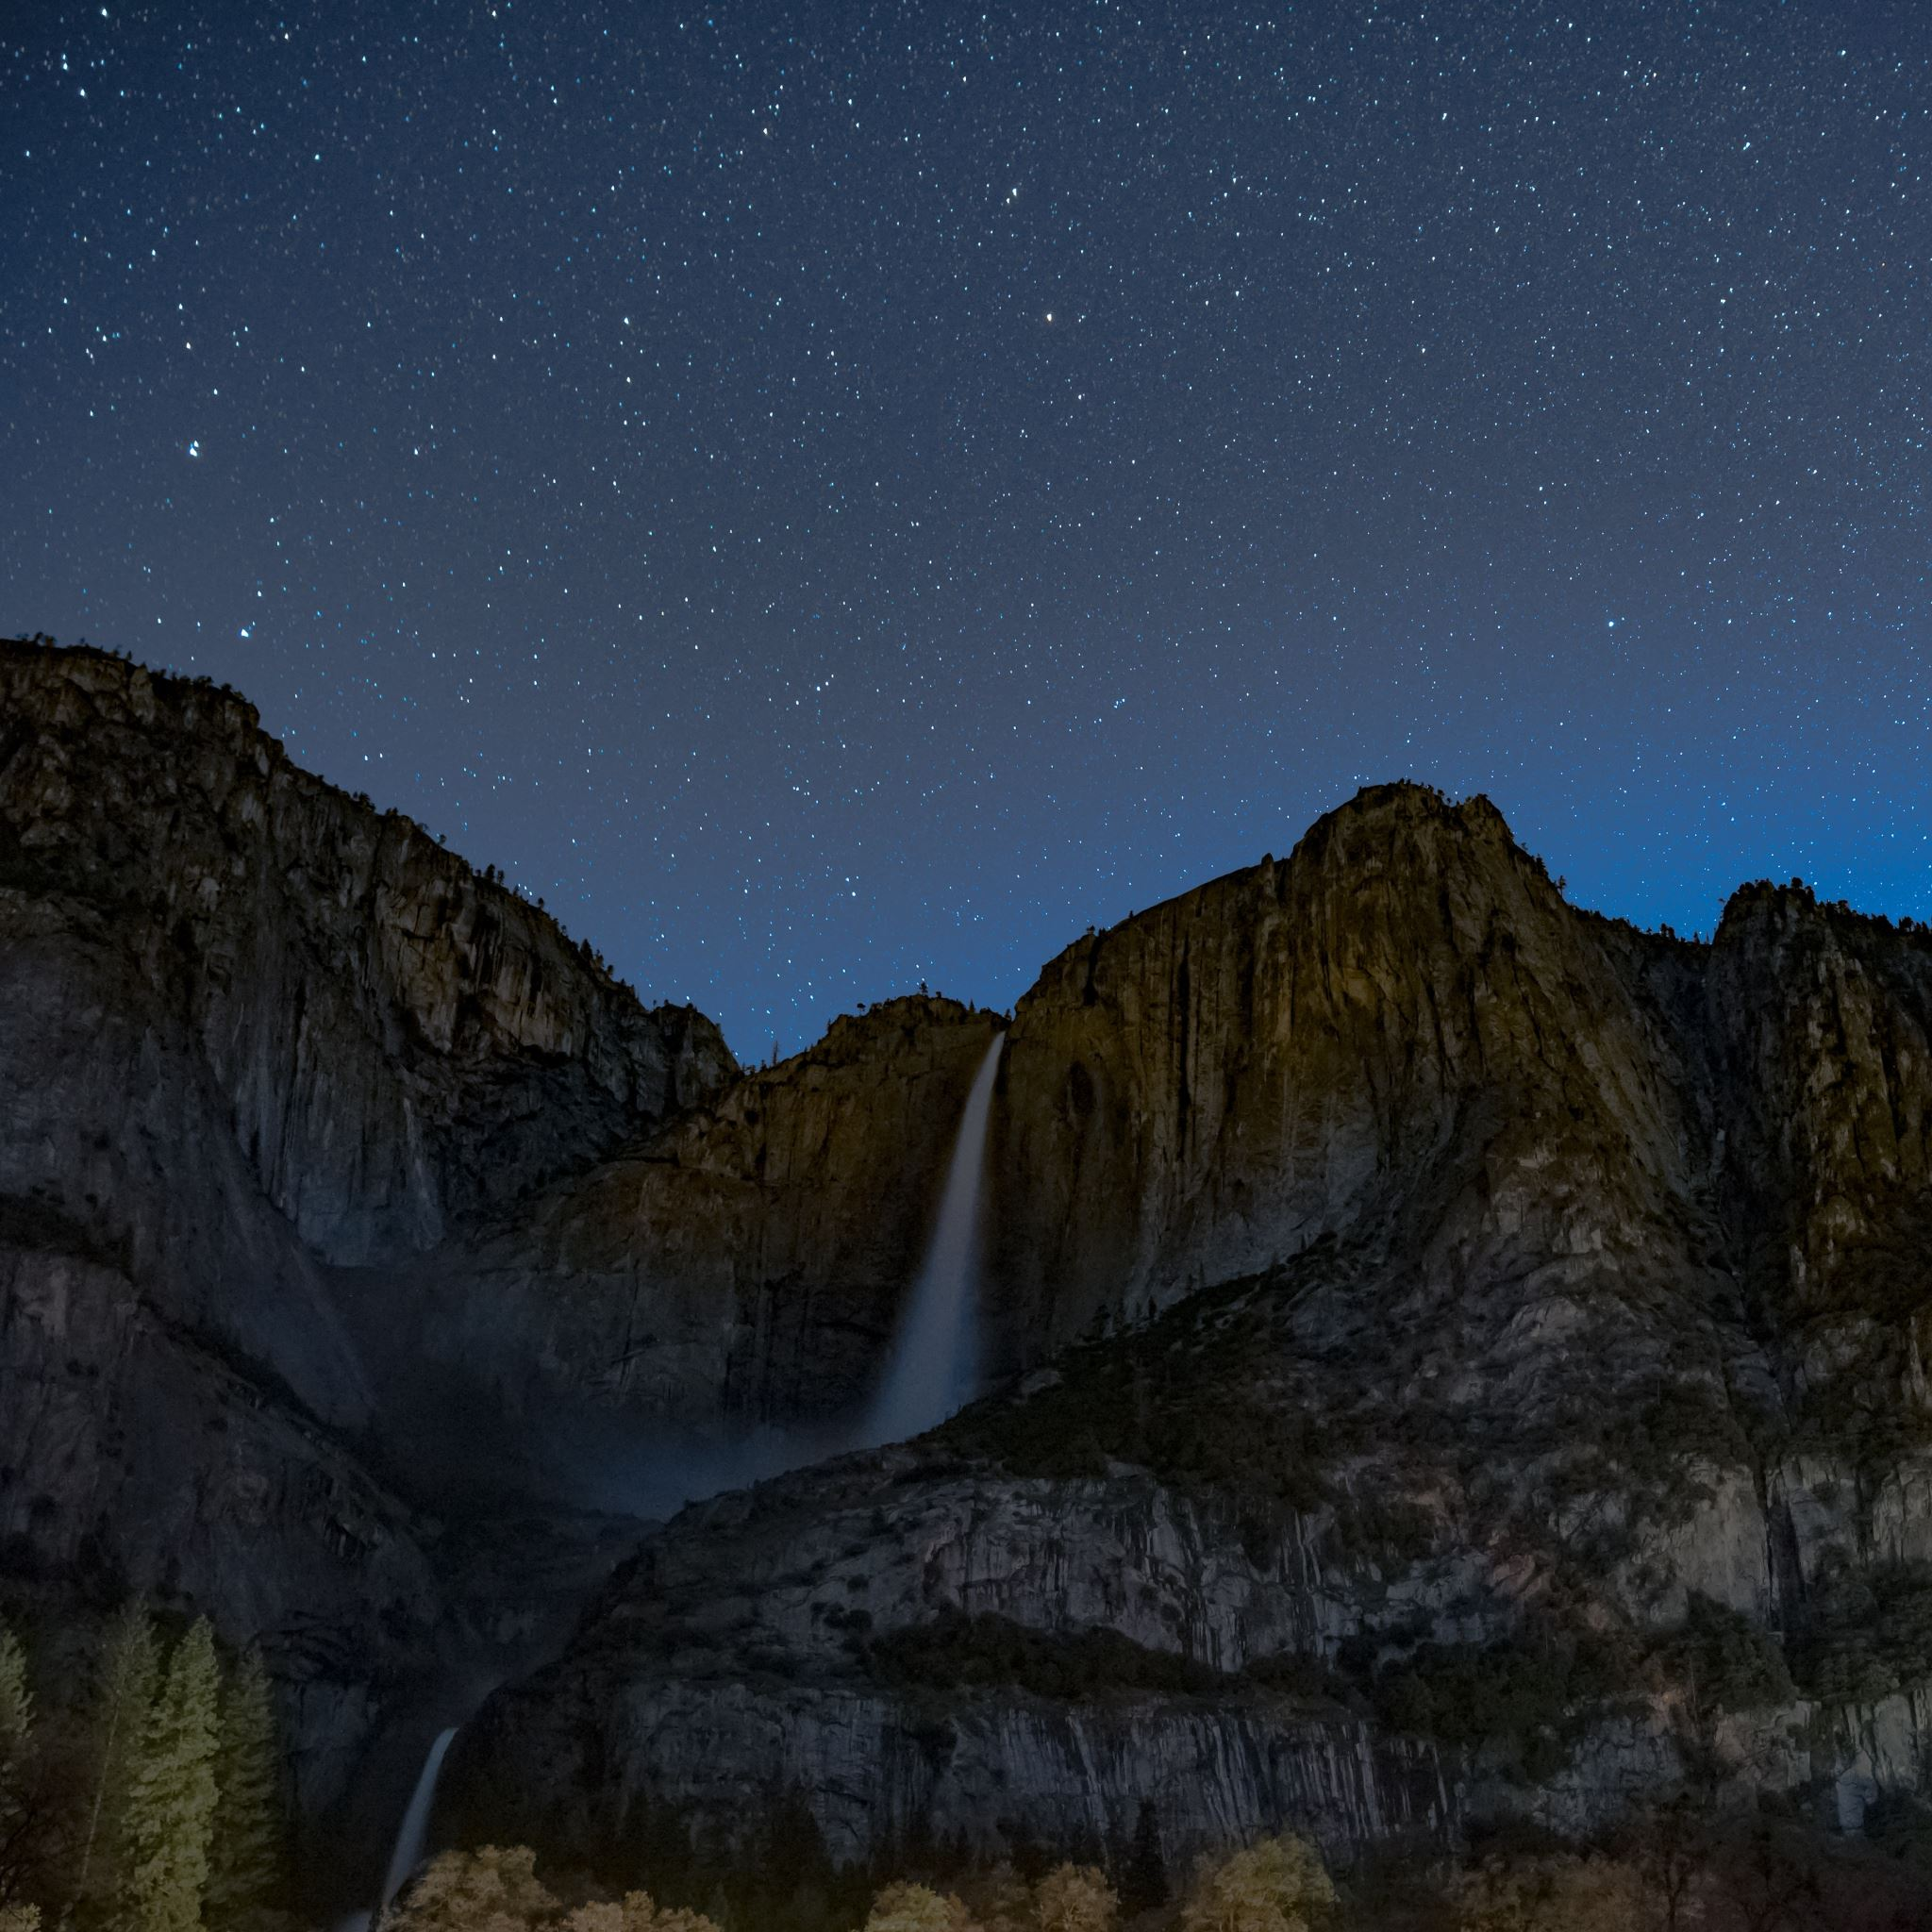 Starry Sky Precipice Waterfall iPad Air wallpaper